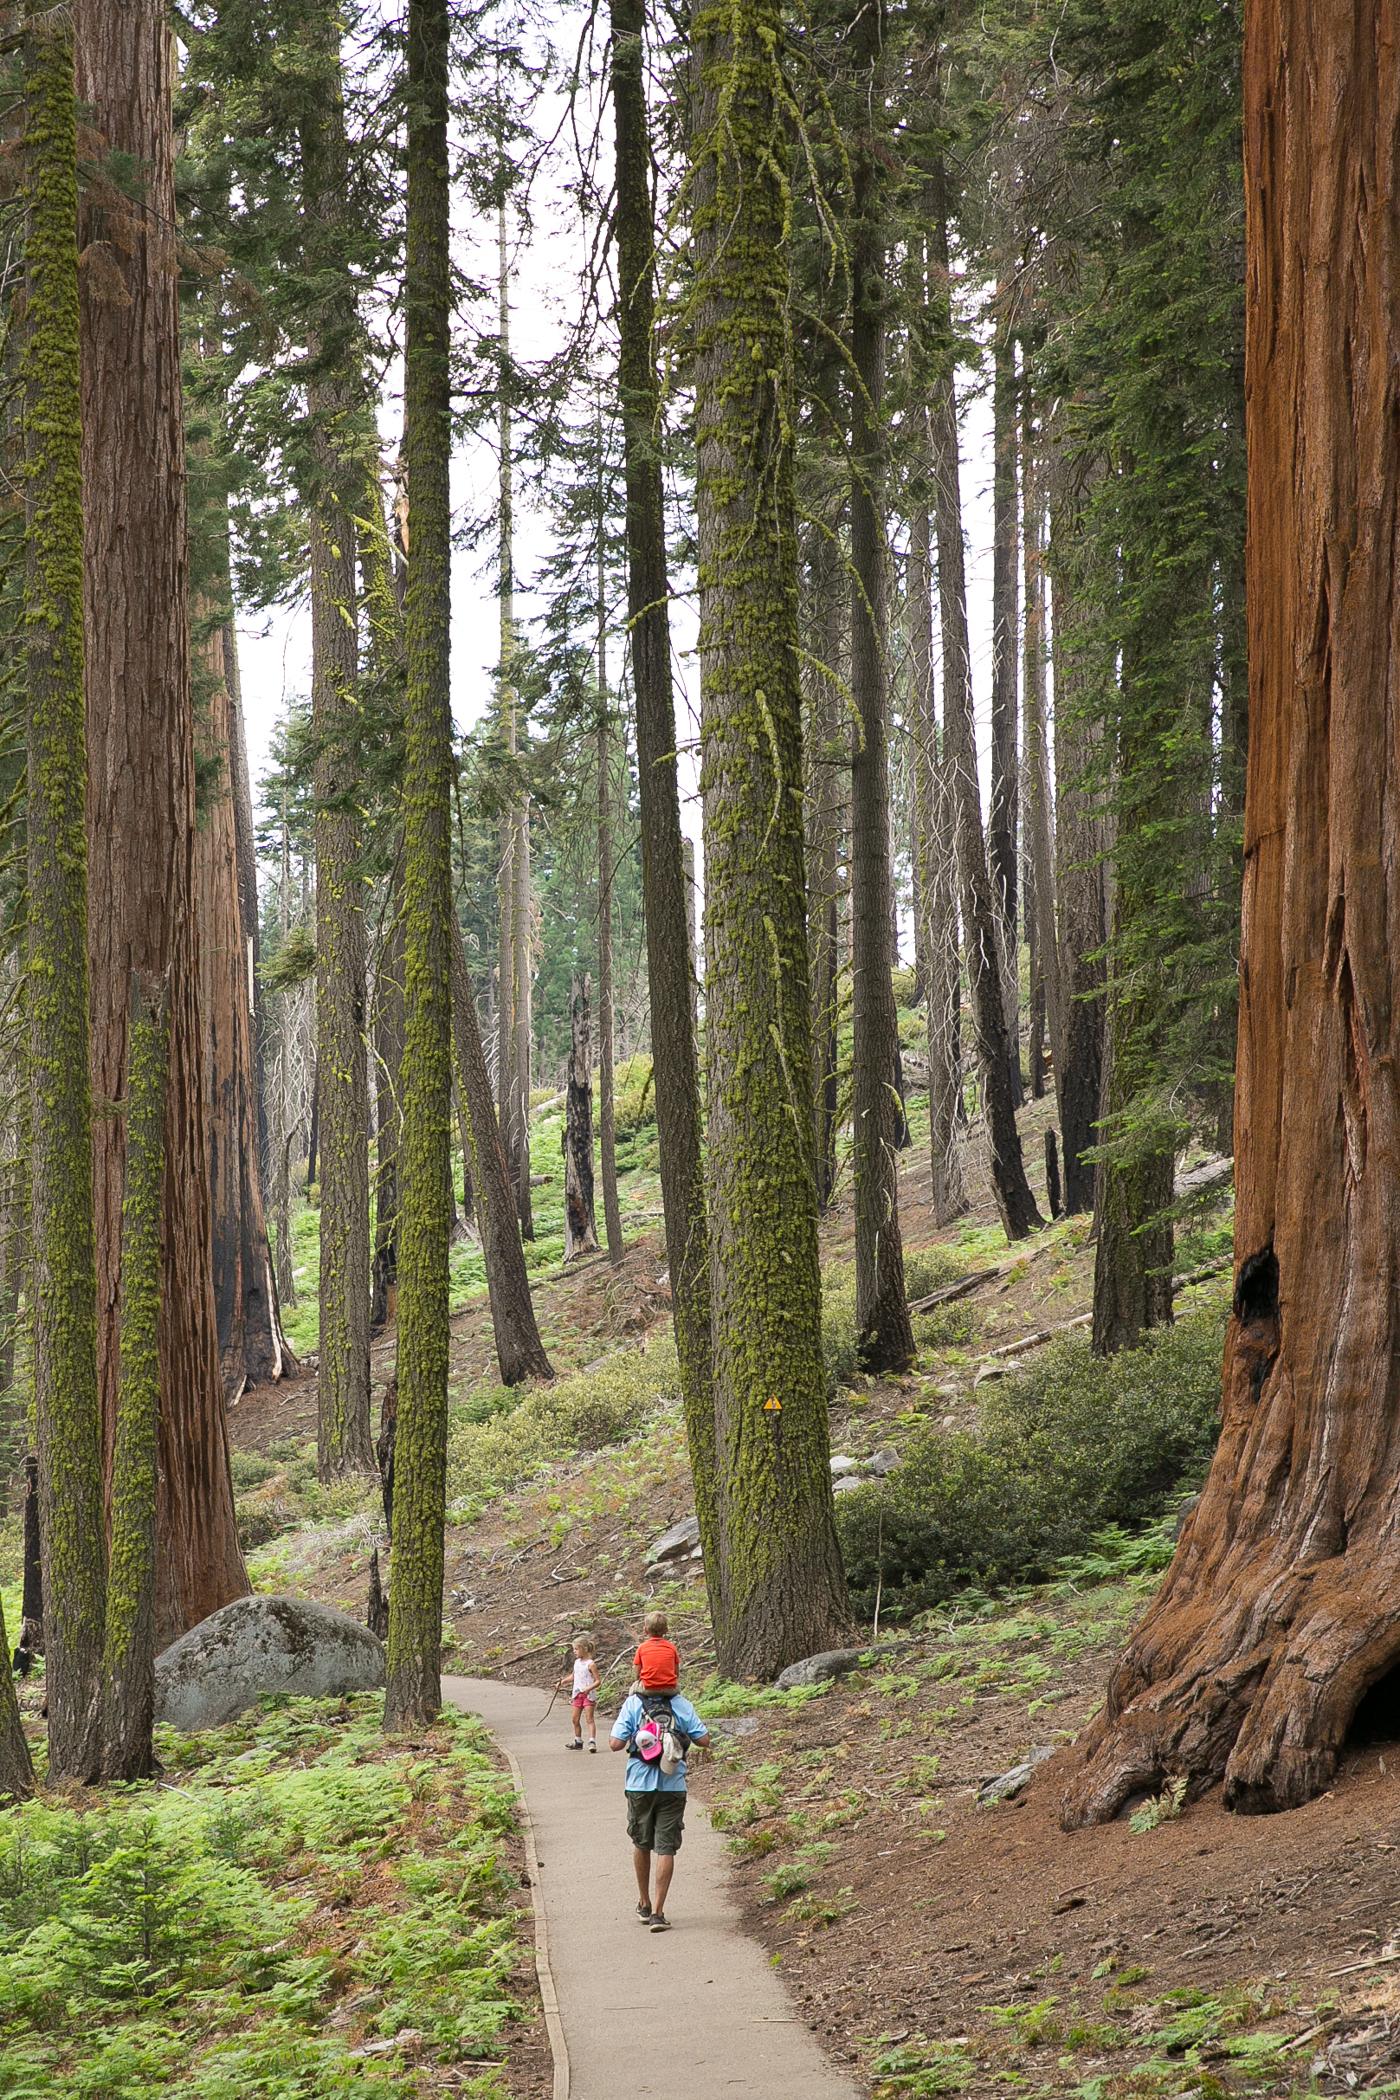 sequoias2017 (1 of 1)-3.jpg